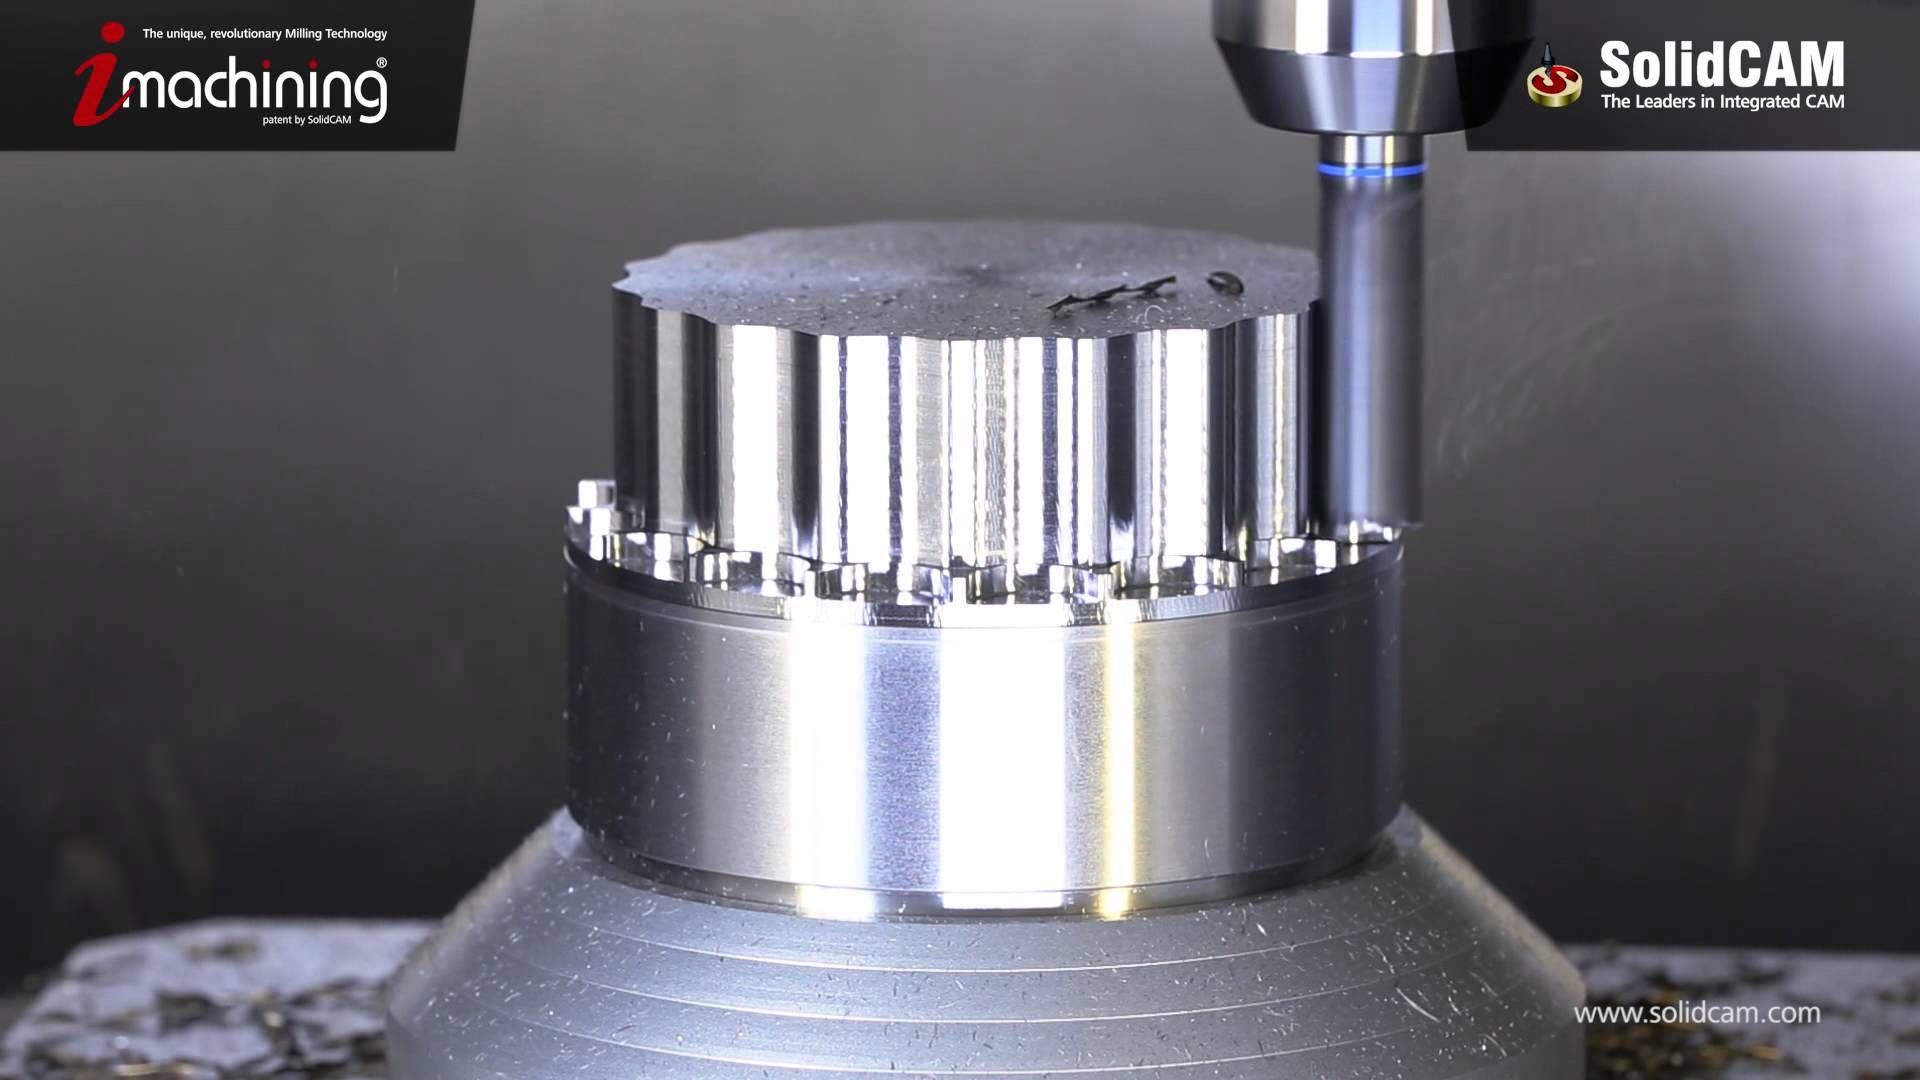 SolidCAM Impeller Milling